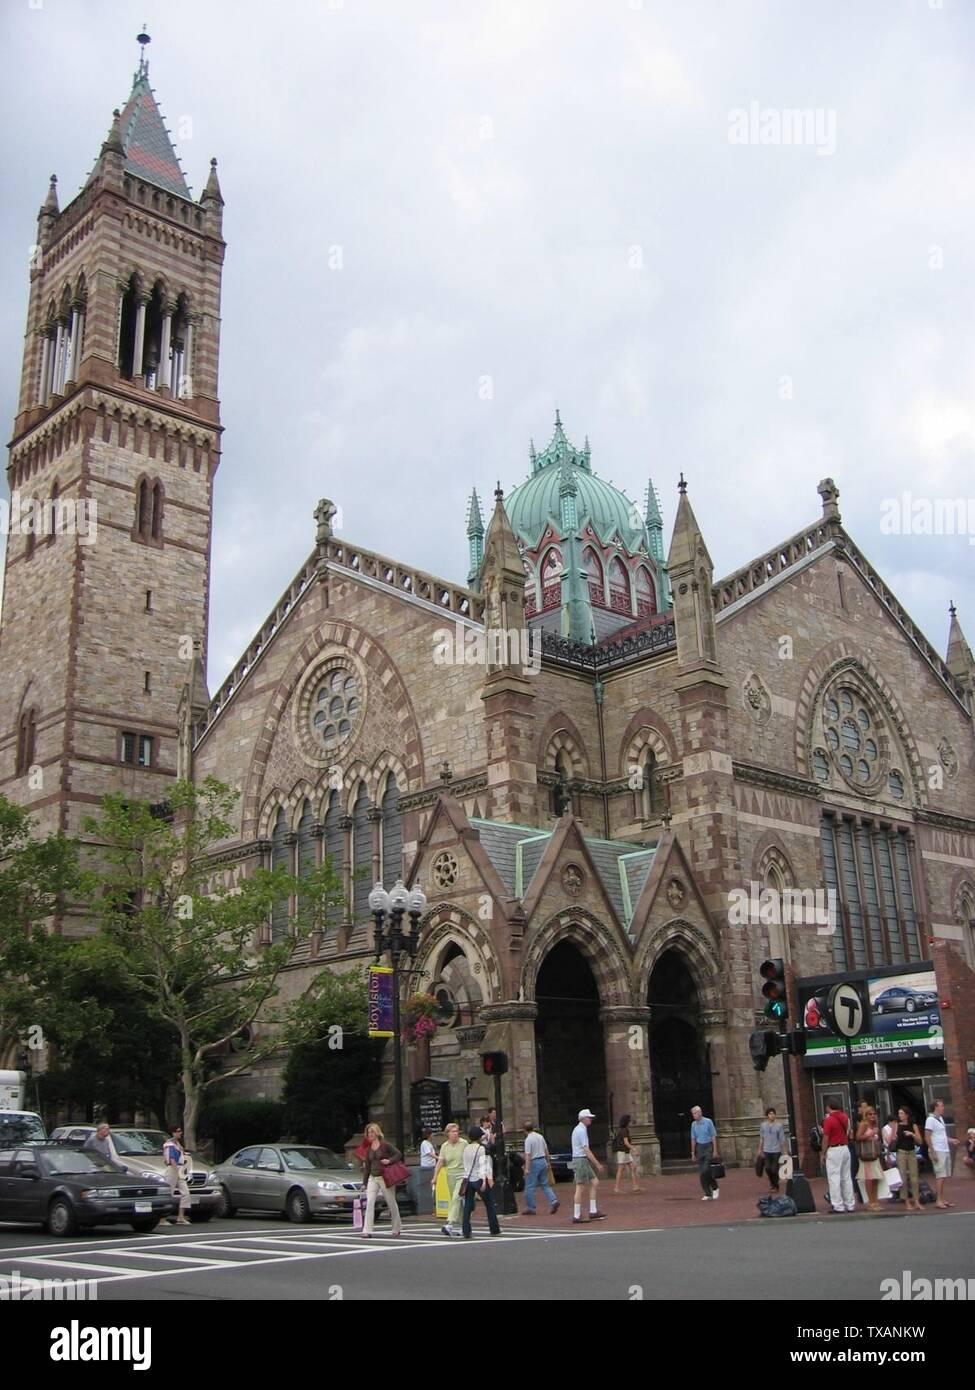 """Inglés: Old South Church, Boston, Massachusetts; el 29 de junio de 2006 (fecha de carga original); trasladado desde en.wikipedia a Commons.; Physicistjedi en Wikipedia en inglés; ' Imagen De Stock"